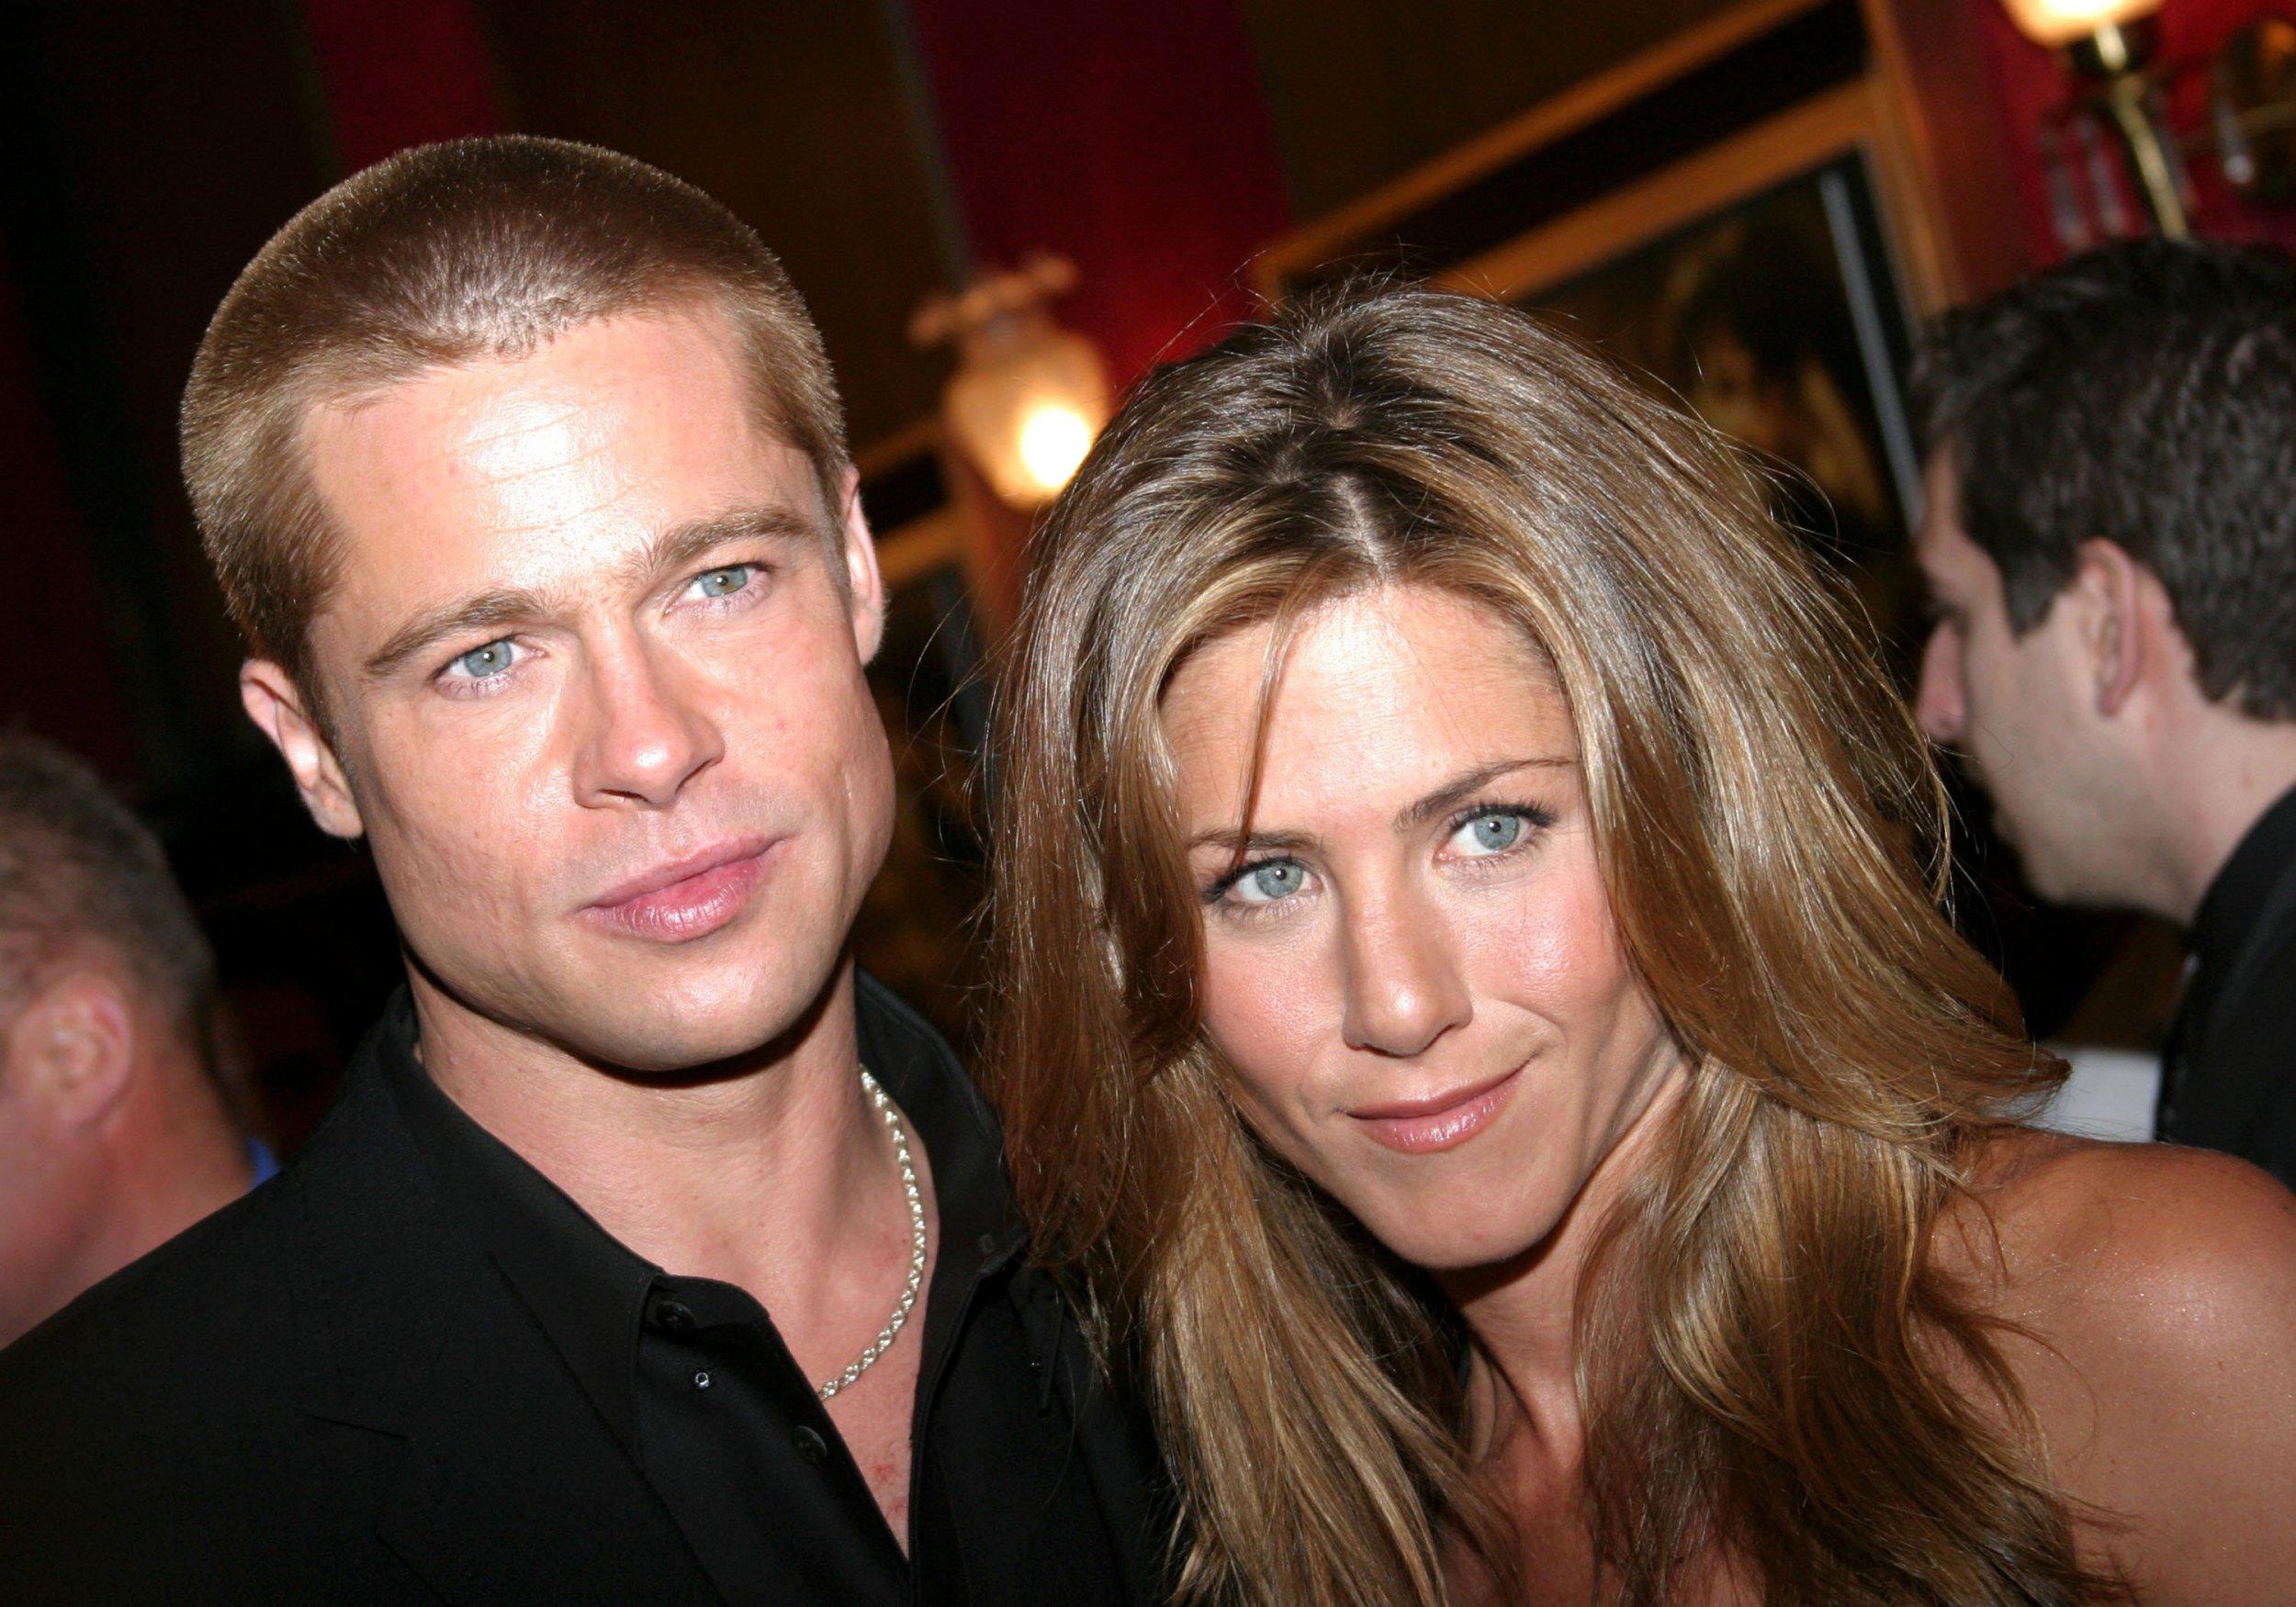 Mandatory Credit: Photo by Sara Jaye/REX/Shutterstock (452237e) Brad Pitt and Jennifer Aniston 'TROY' FILM PREMIERE, NEW YORK, AMERICA - 10 MAY 2004